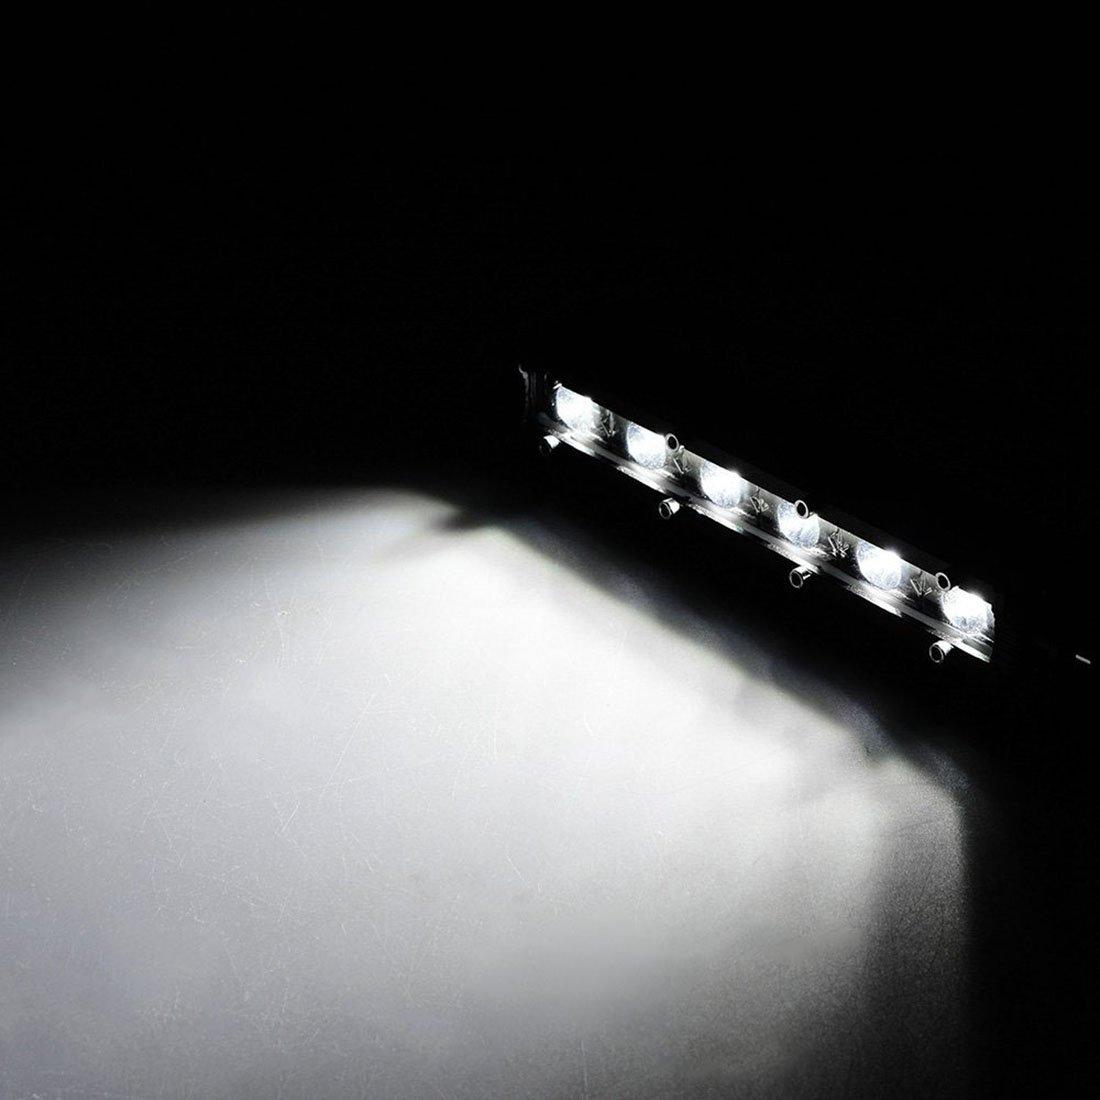 1 Year Warranty 4PCS Safego 4 Inch 72W LED Work Light Bar 6000LM LED Spotlight Cree Off Road Driving Fog Lights for Car ATV UTV SUV Truck Boat Motorcycle 12V//24V